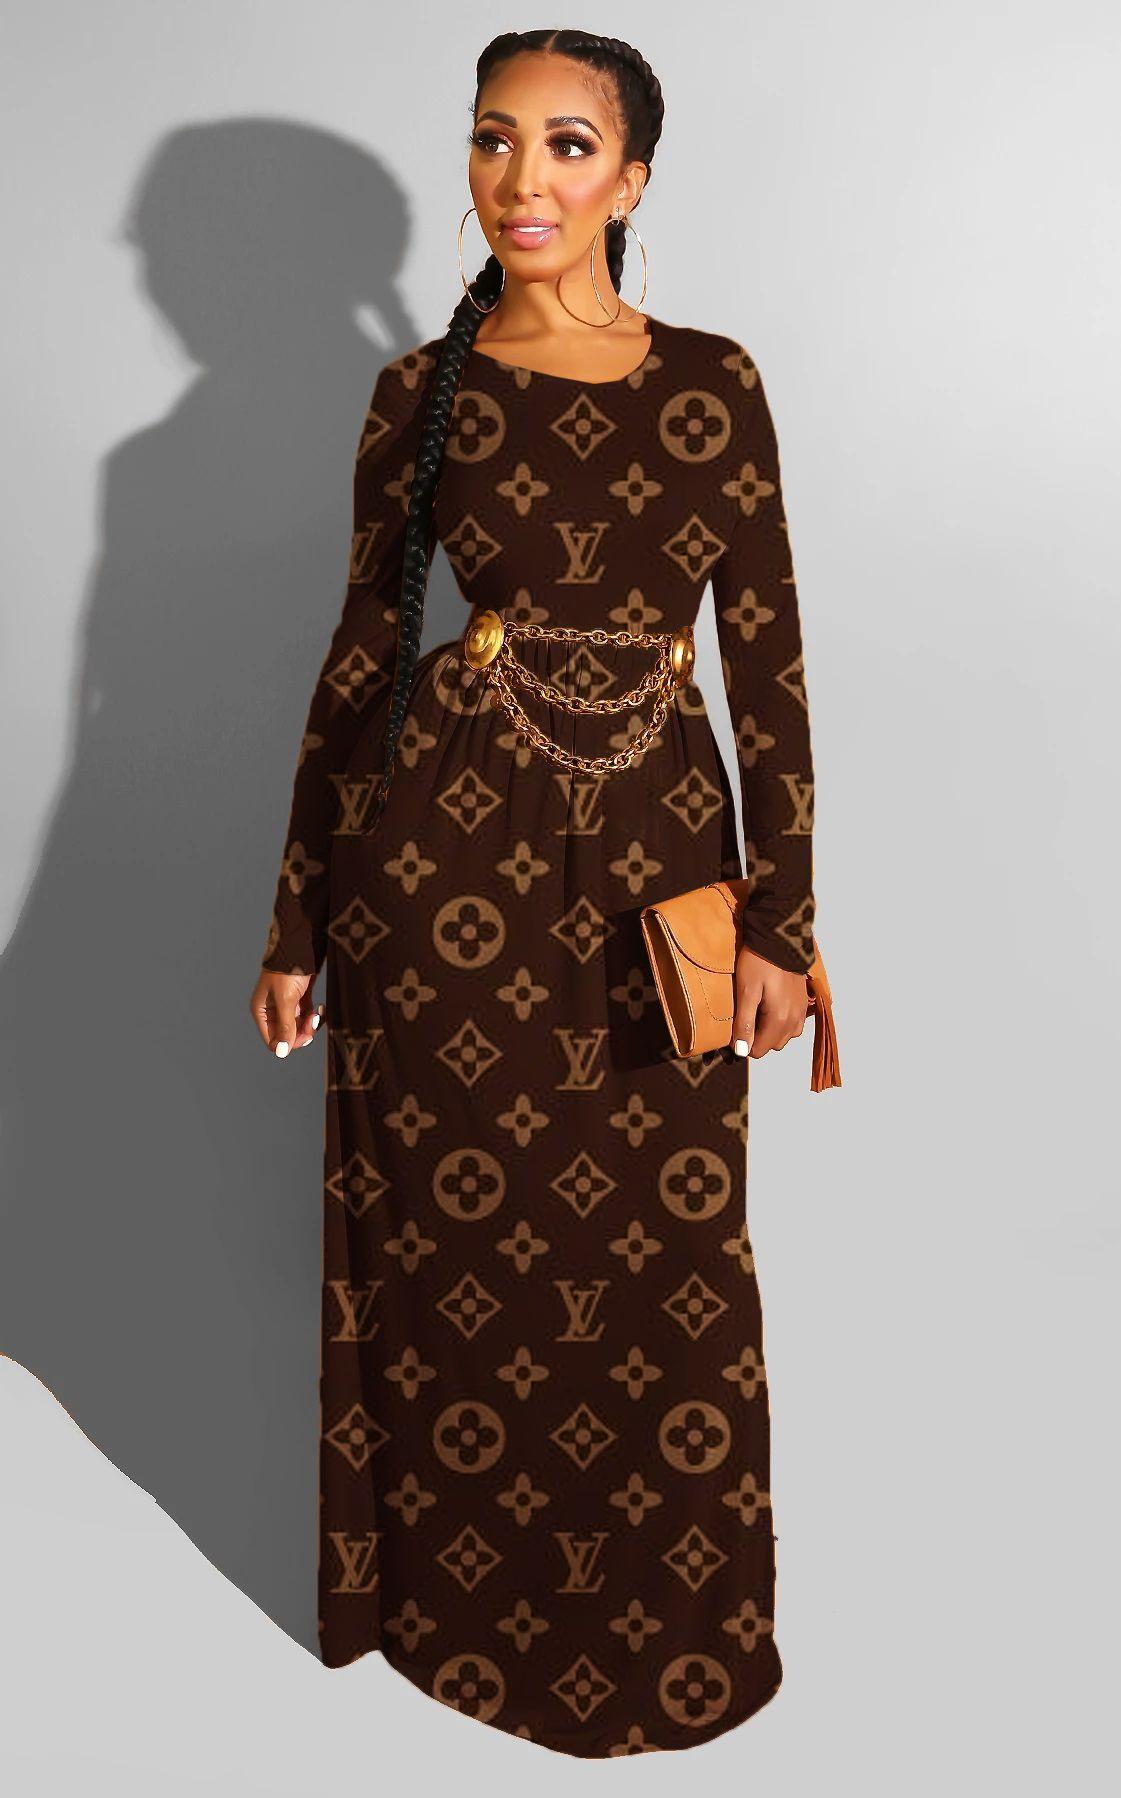 39L059 womens designer floor-length skirt one piece dress high quality loose dress sexy elegant luxury fashion skirt maxi dress hot